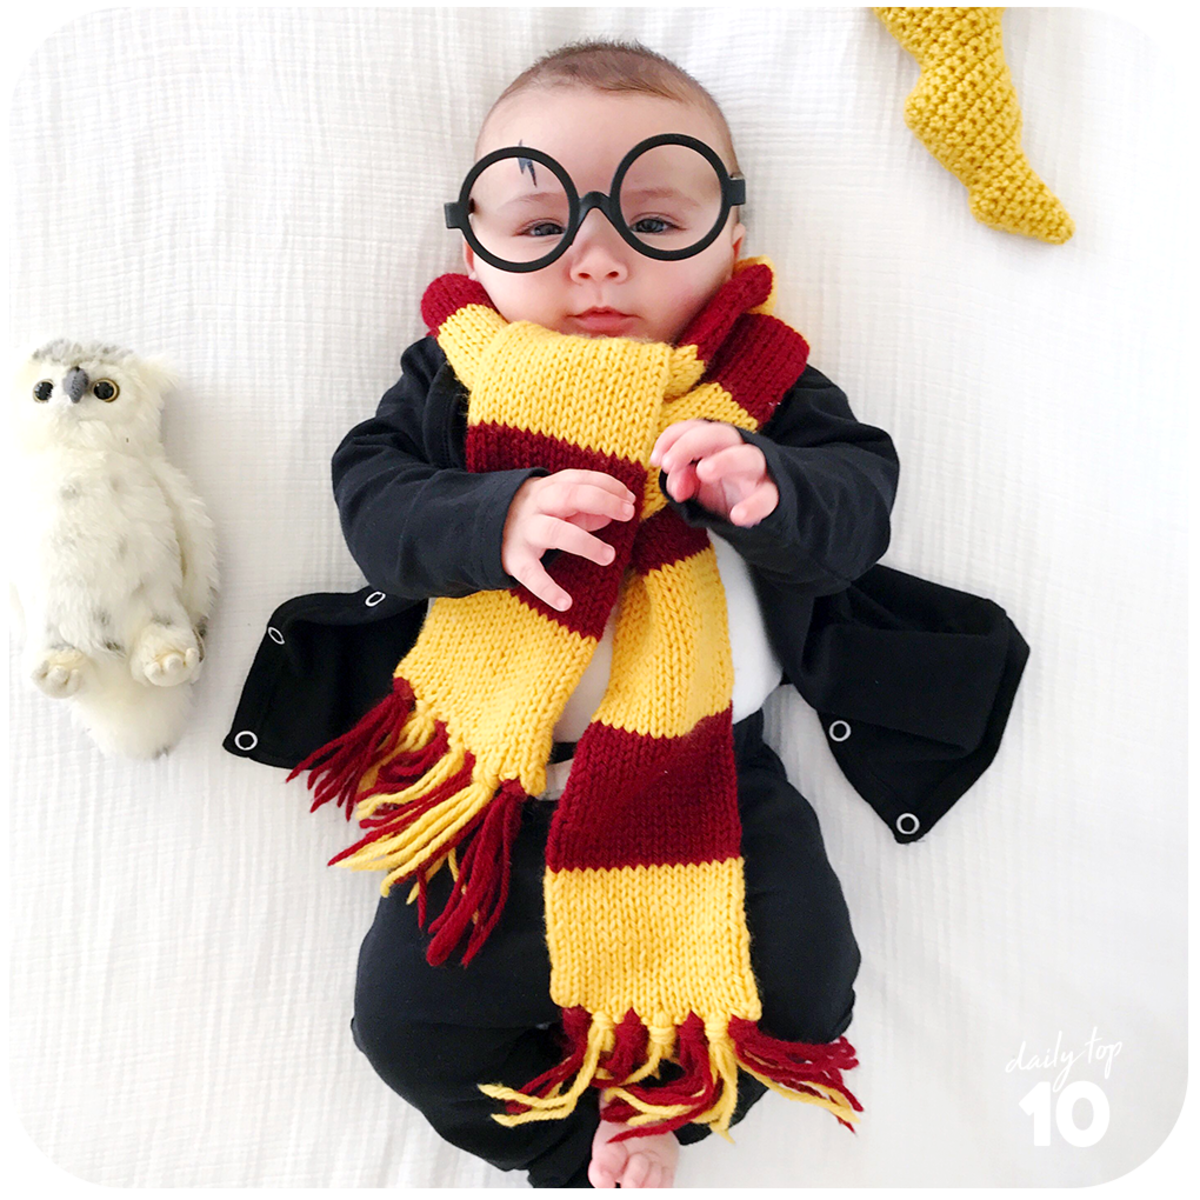 Geeky Baby Costume